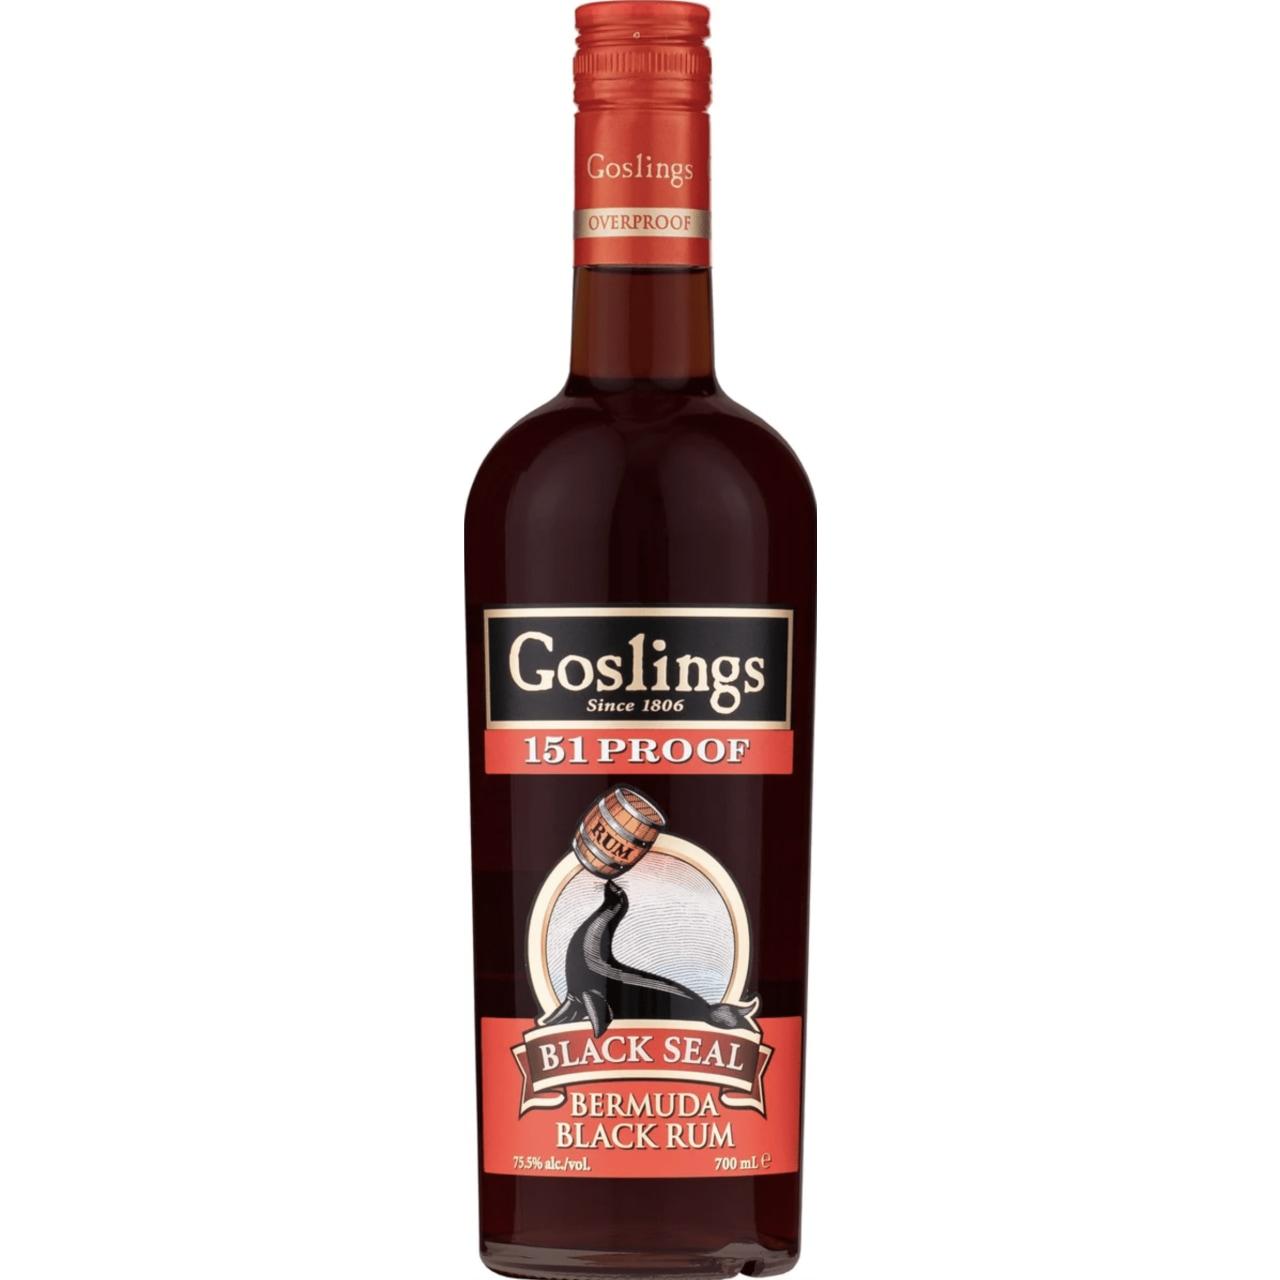 Gosling's Black Seal Overproof 151 Rum